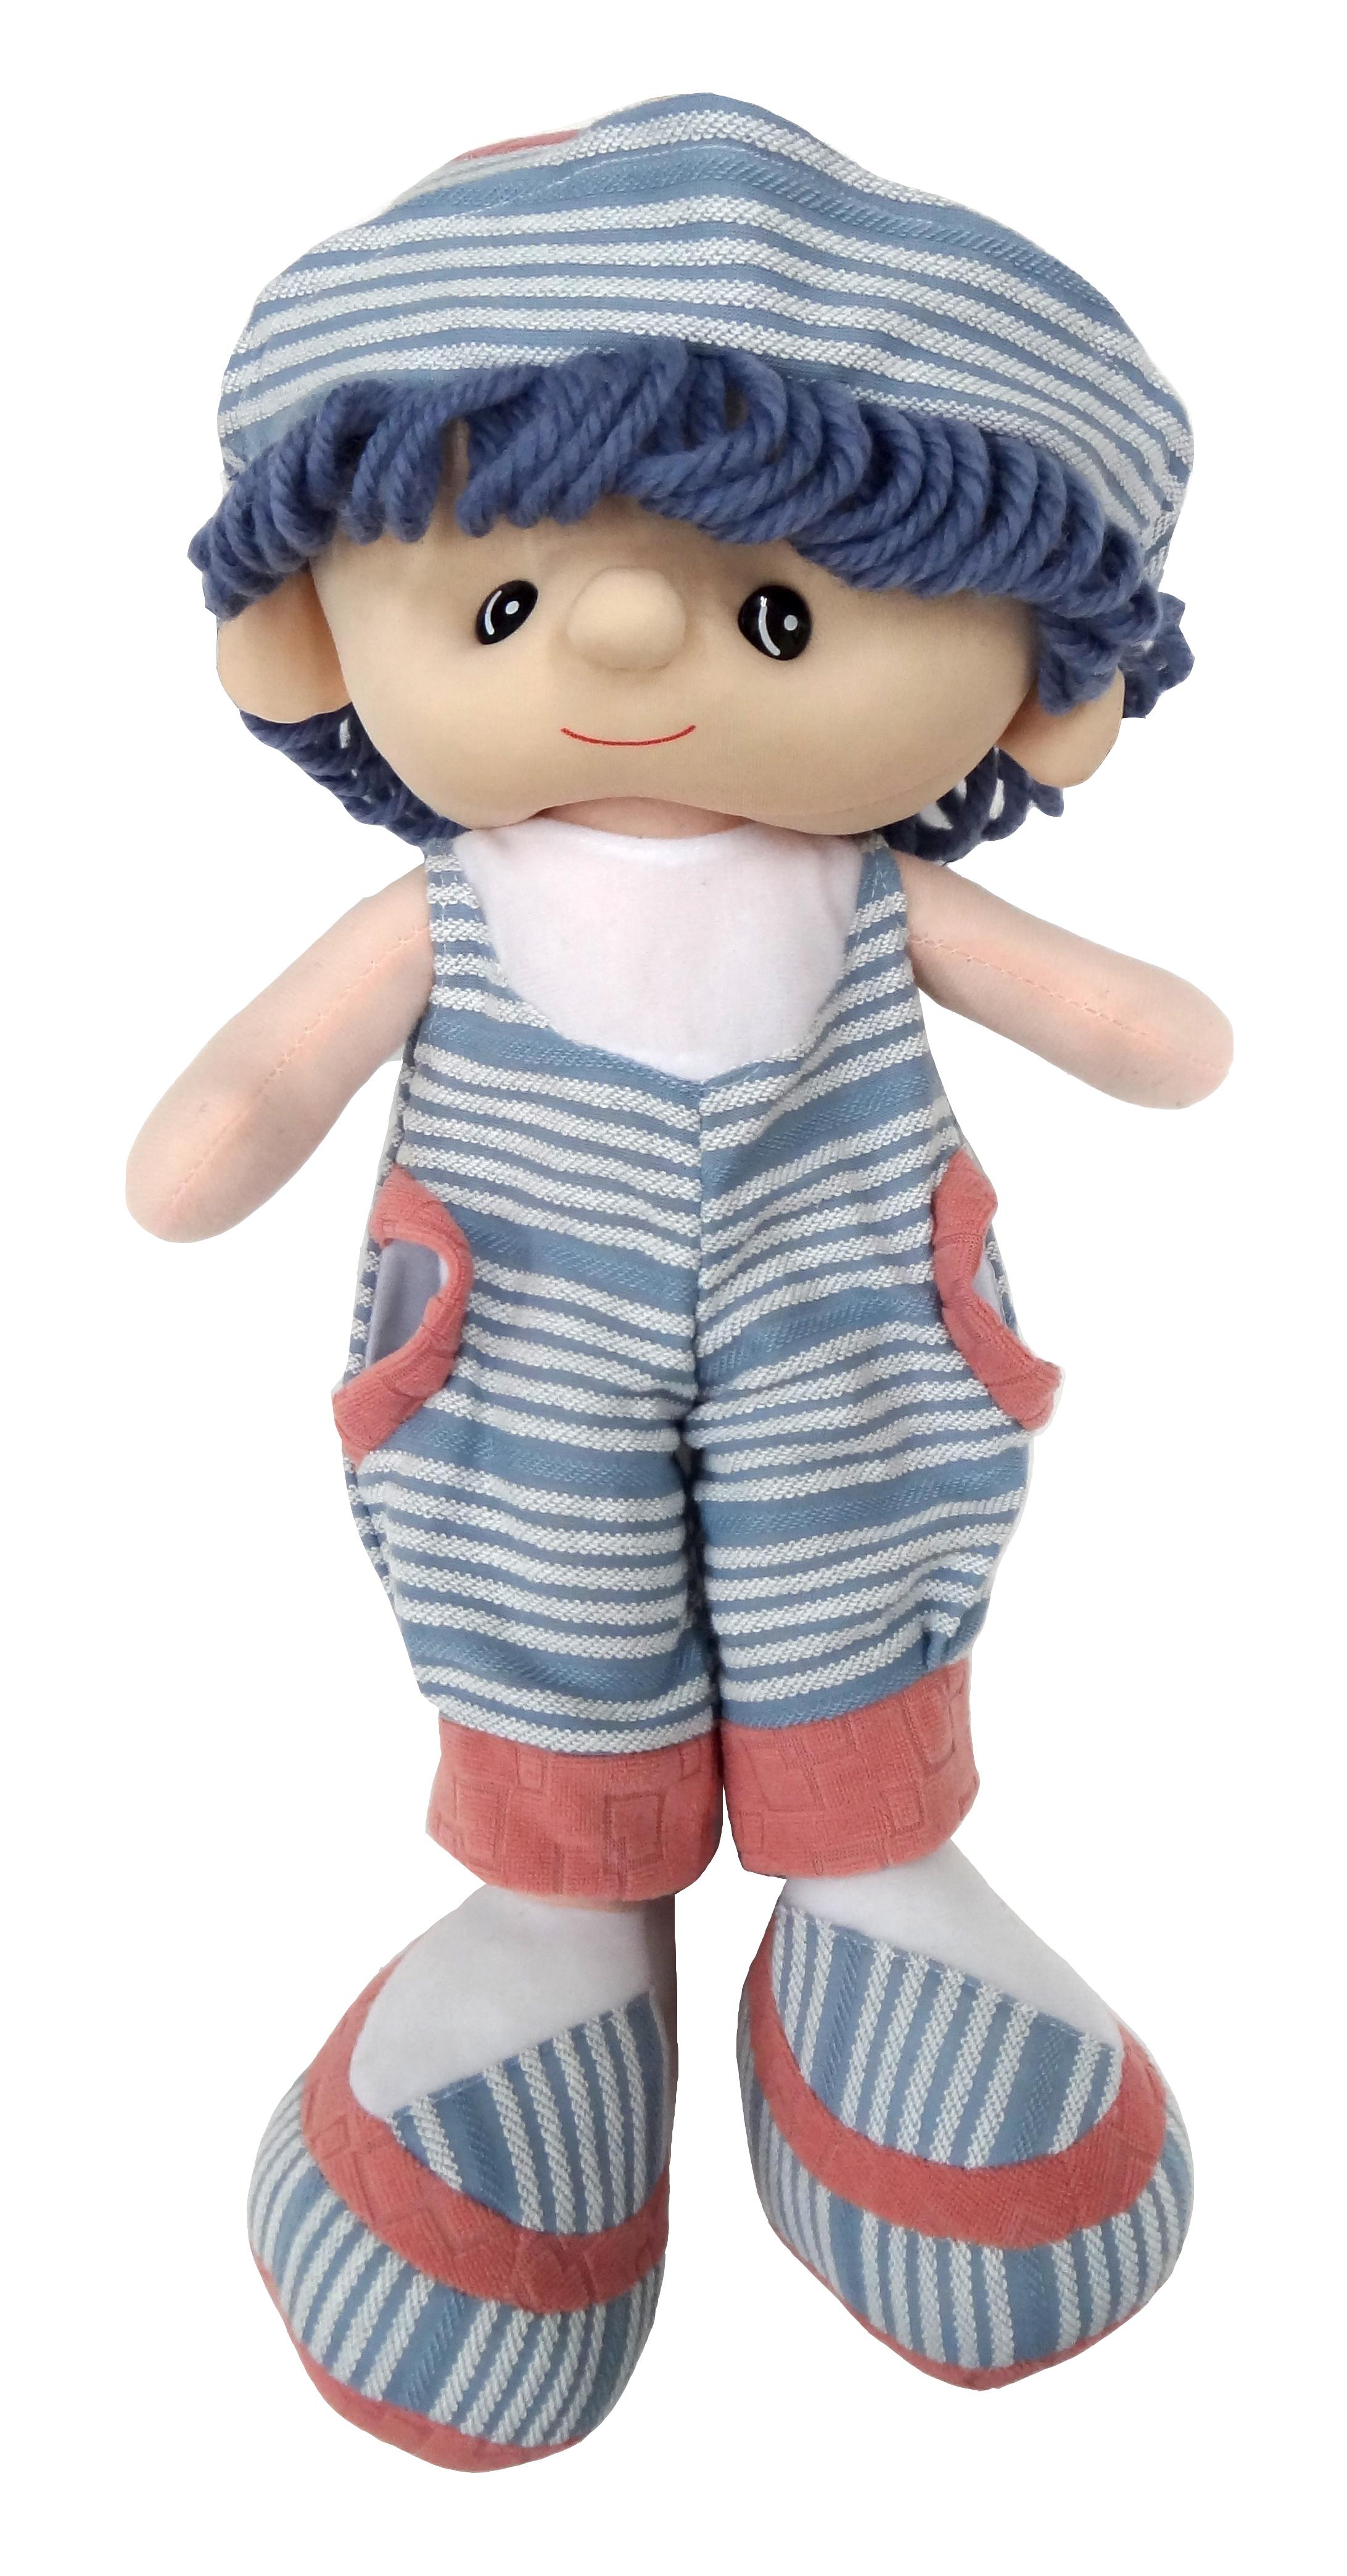 "Мягкая кукла Правила Успеха модель ""Яша"", 4610009215990"